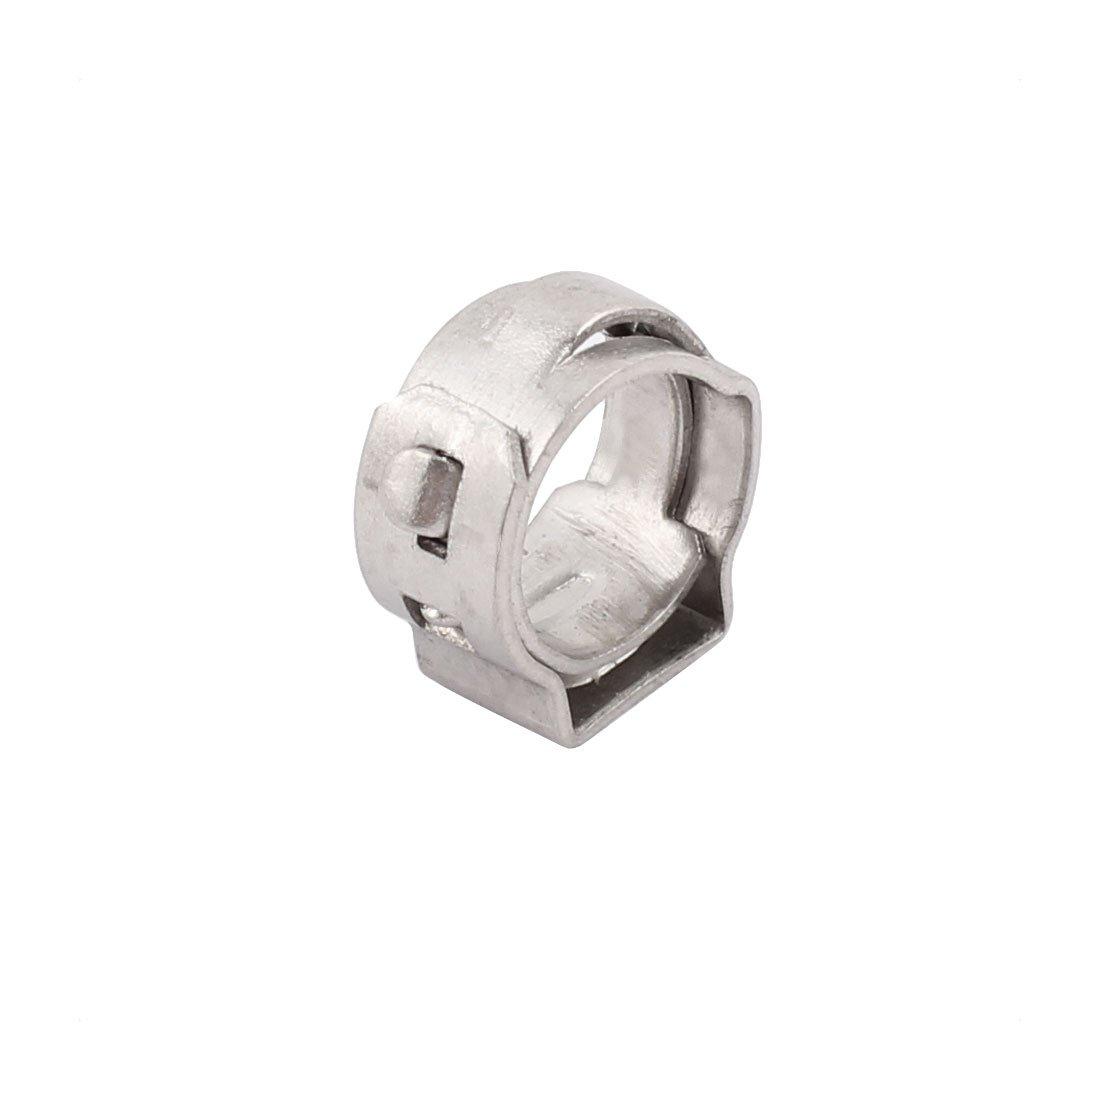 sourcing map 6.3mm-7.5mm 304 Acier inoxydable Ajustable Tube Collier serrages Argent 15pcs